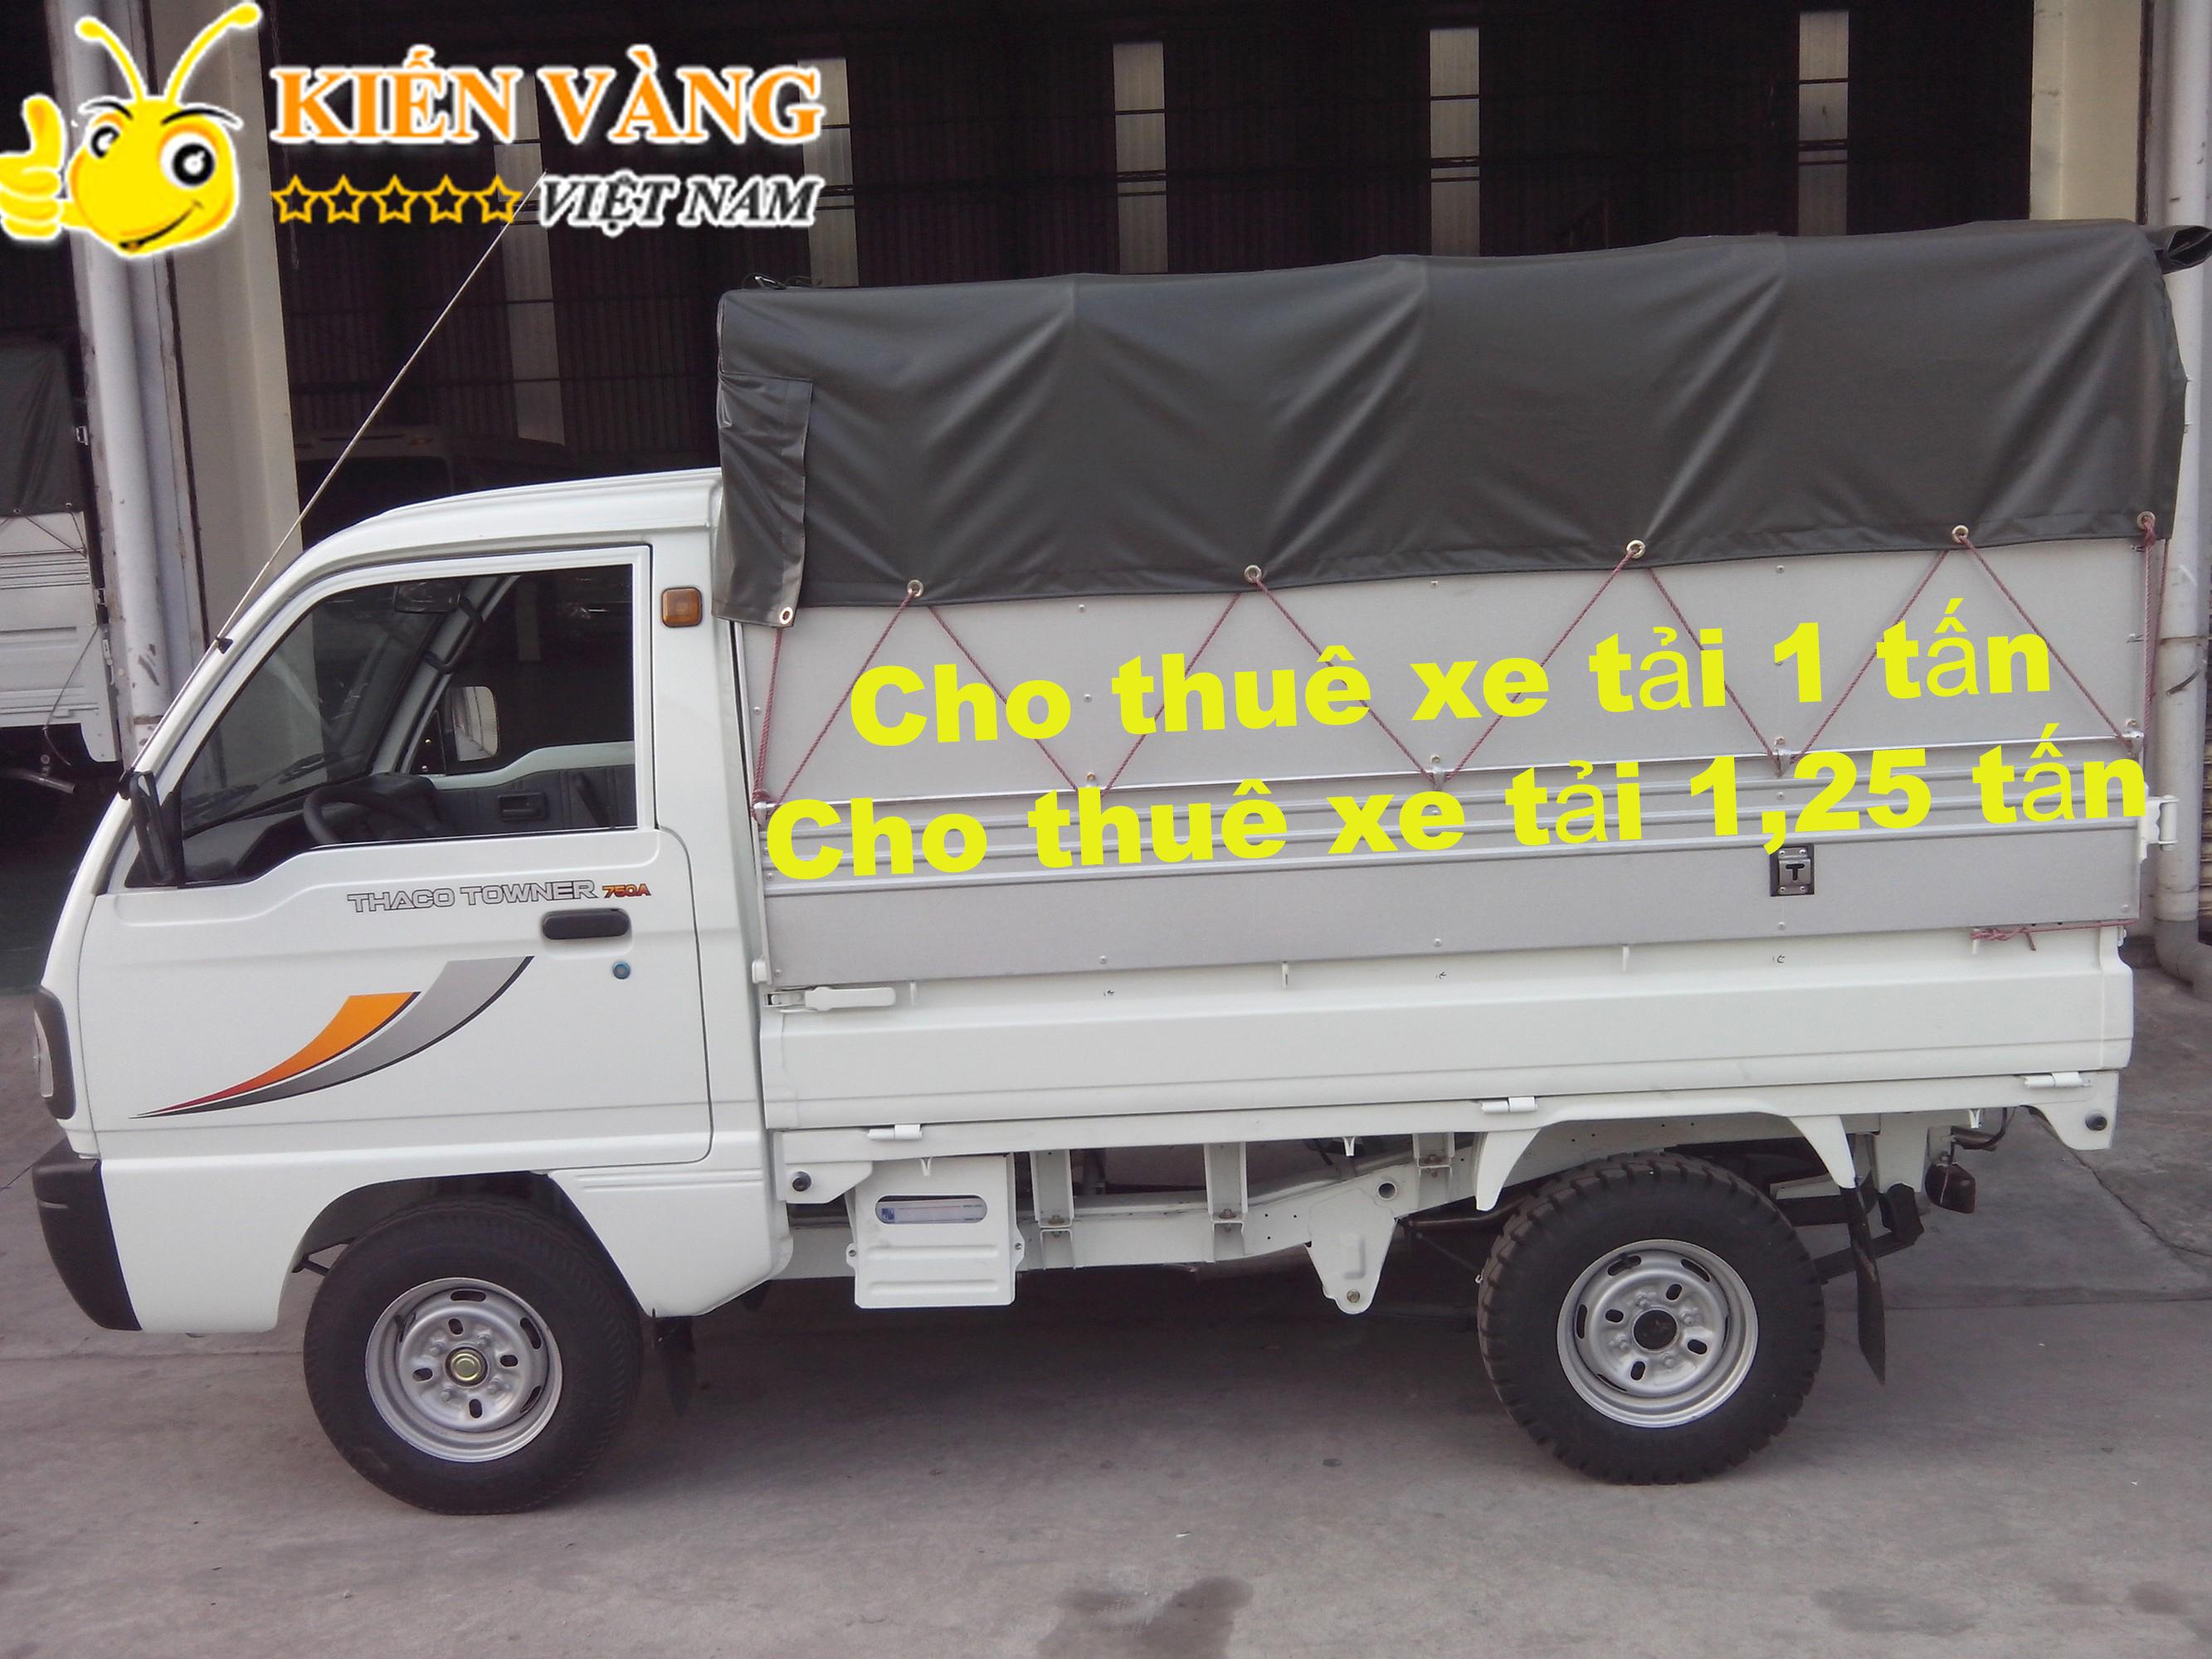 cho thuê xe tải 1 tấn, cho thuê xe tải 1,25 tấn